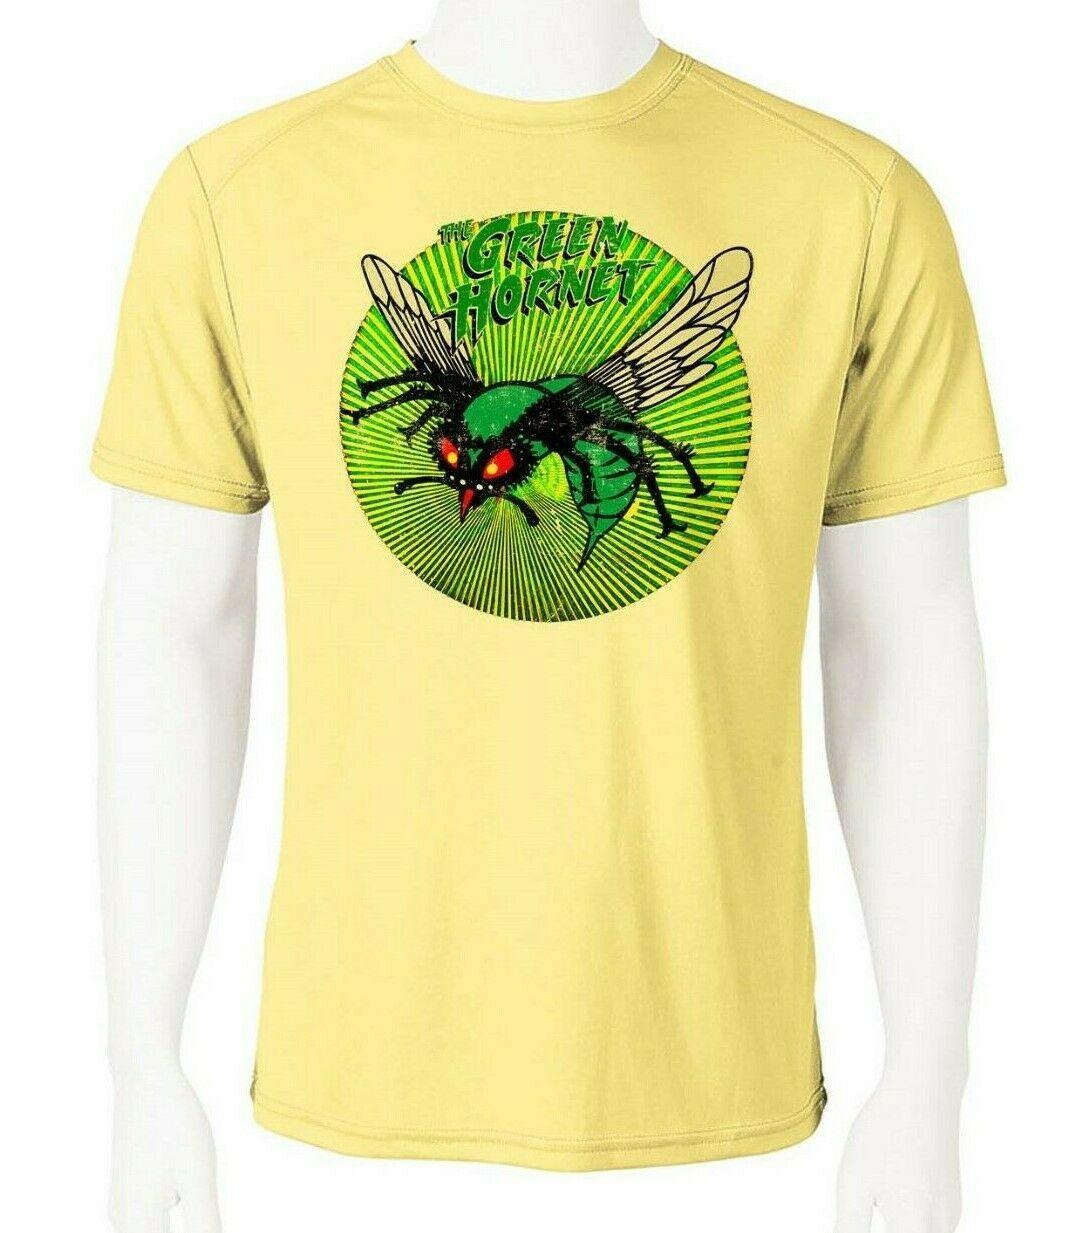 Green hornet dri fit graphic tshirt moisture wicking superhero comic spf tee 2